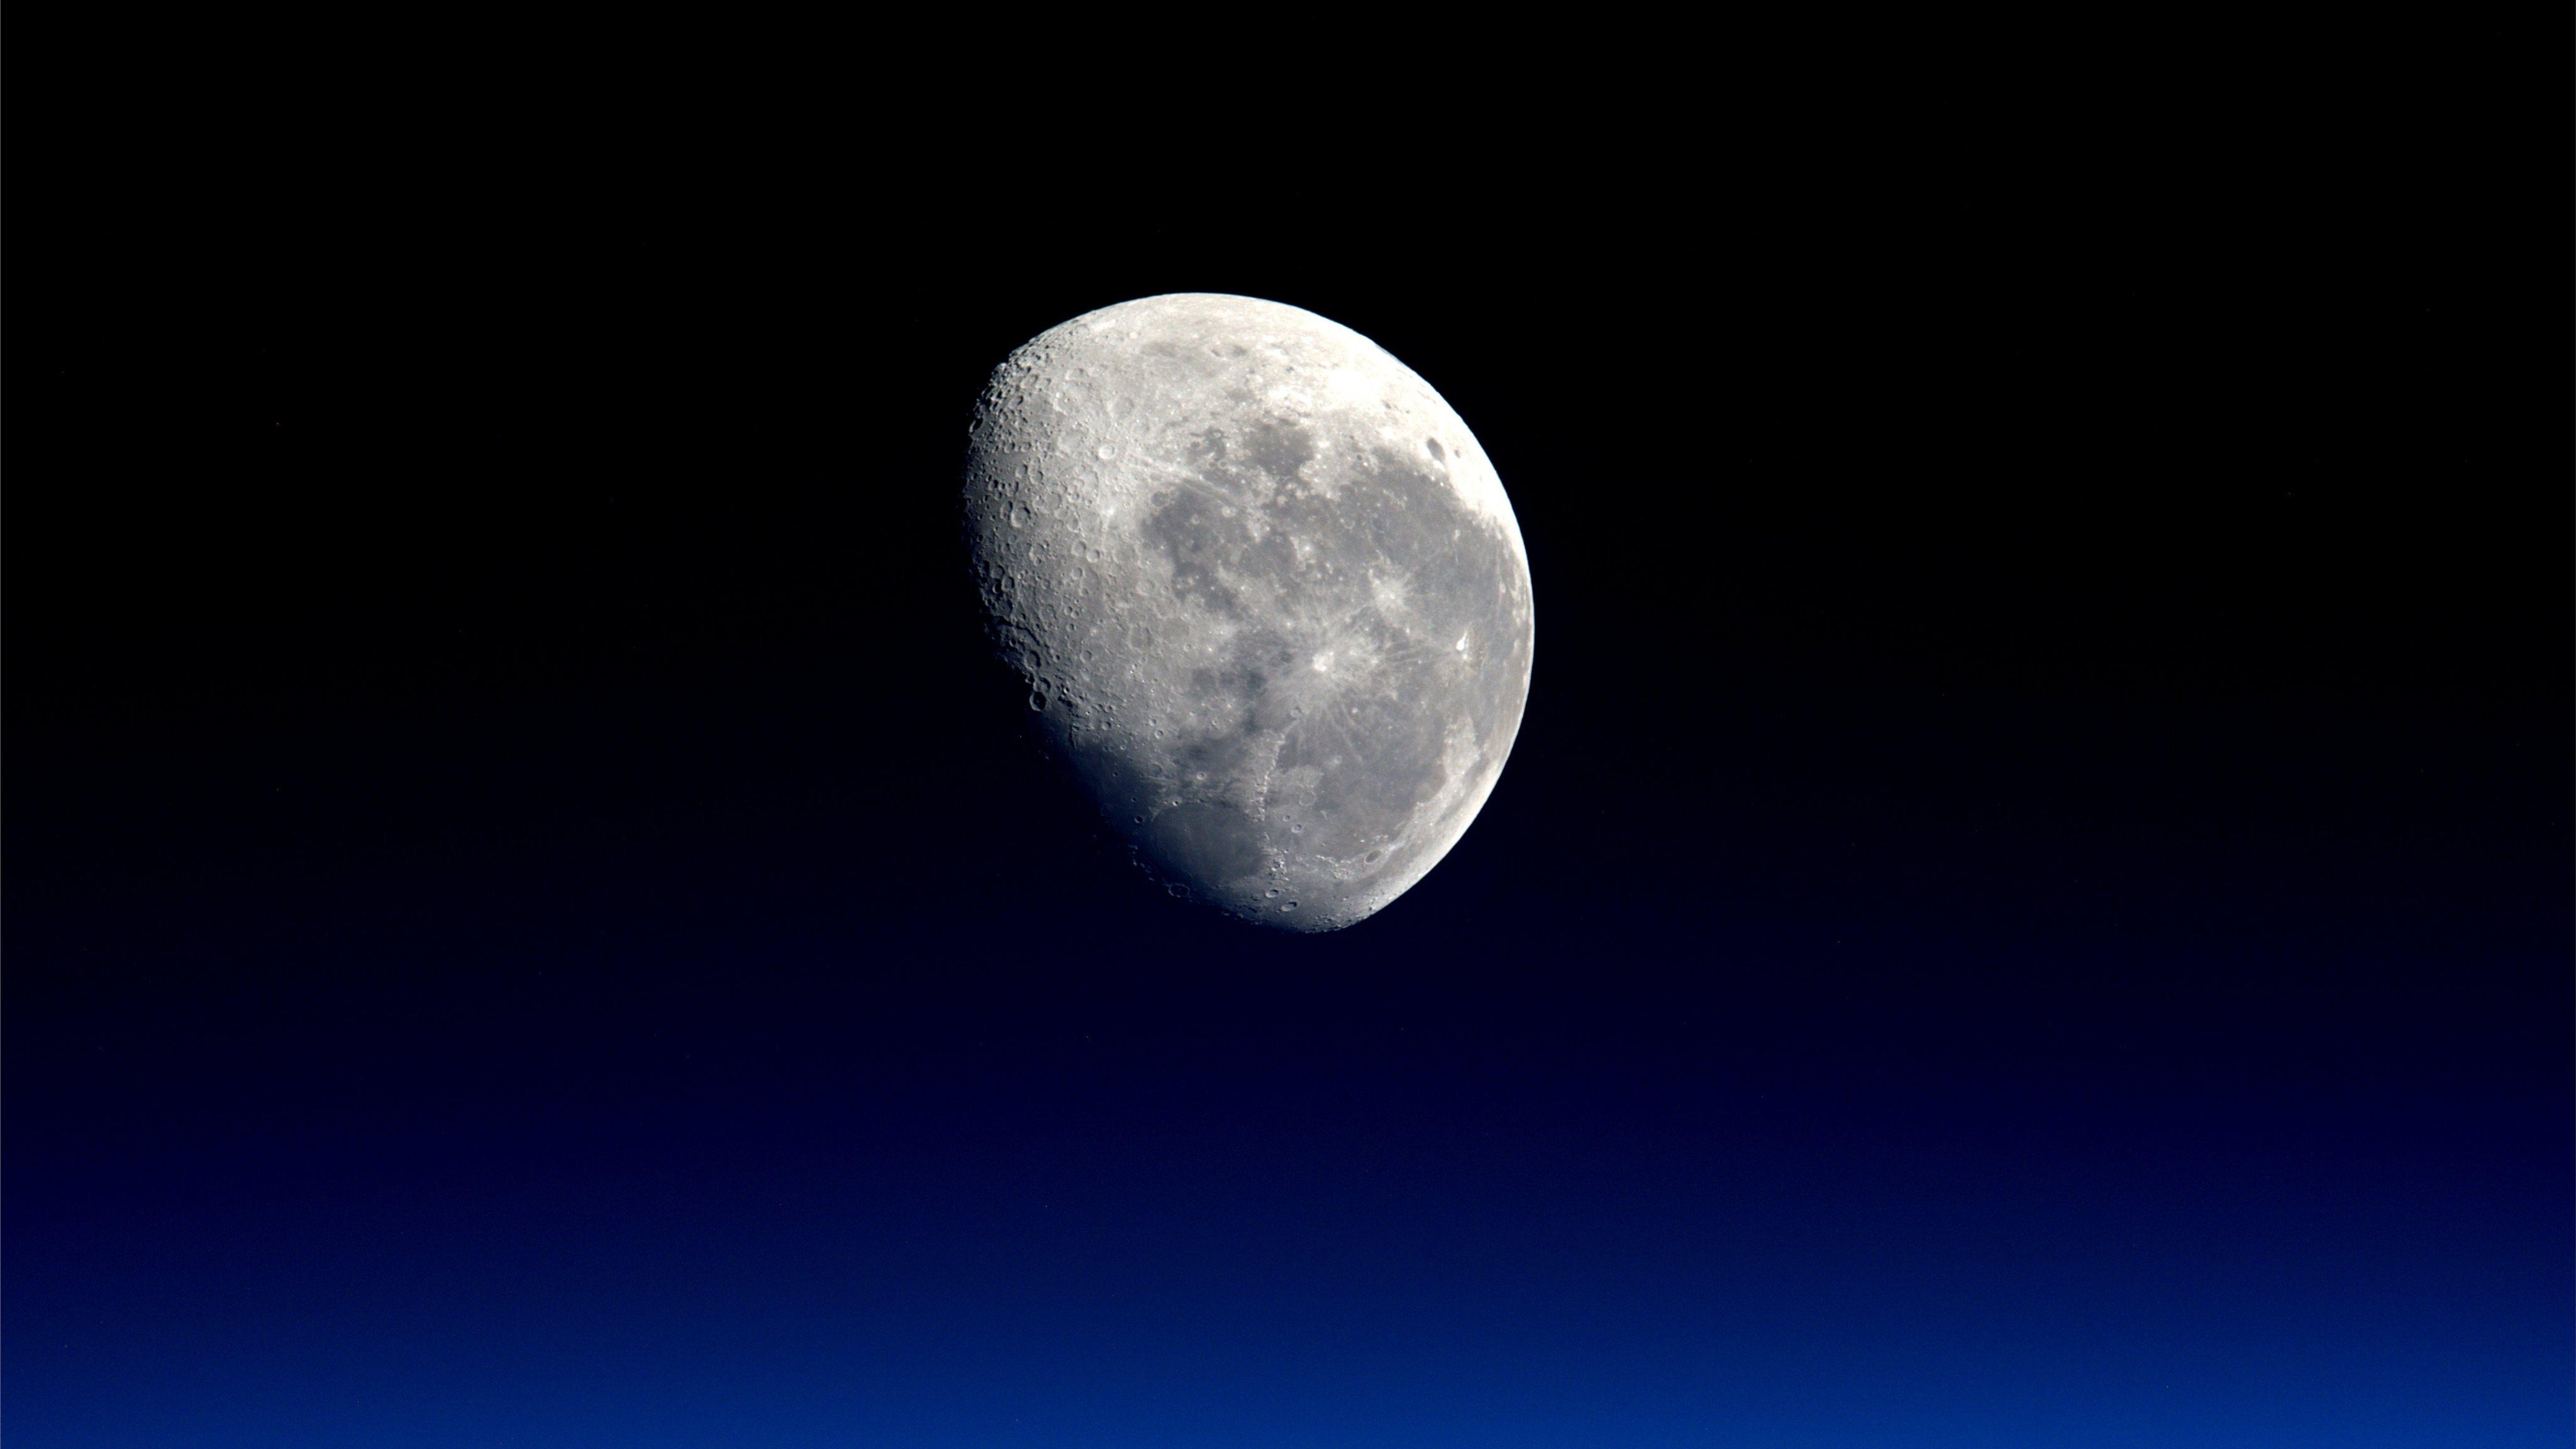 Moon close-up by NASA Mac Wallpaper Download | AllMacWallpaper